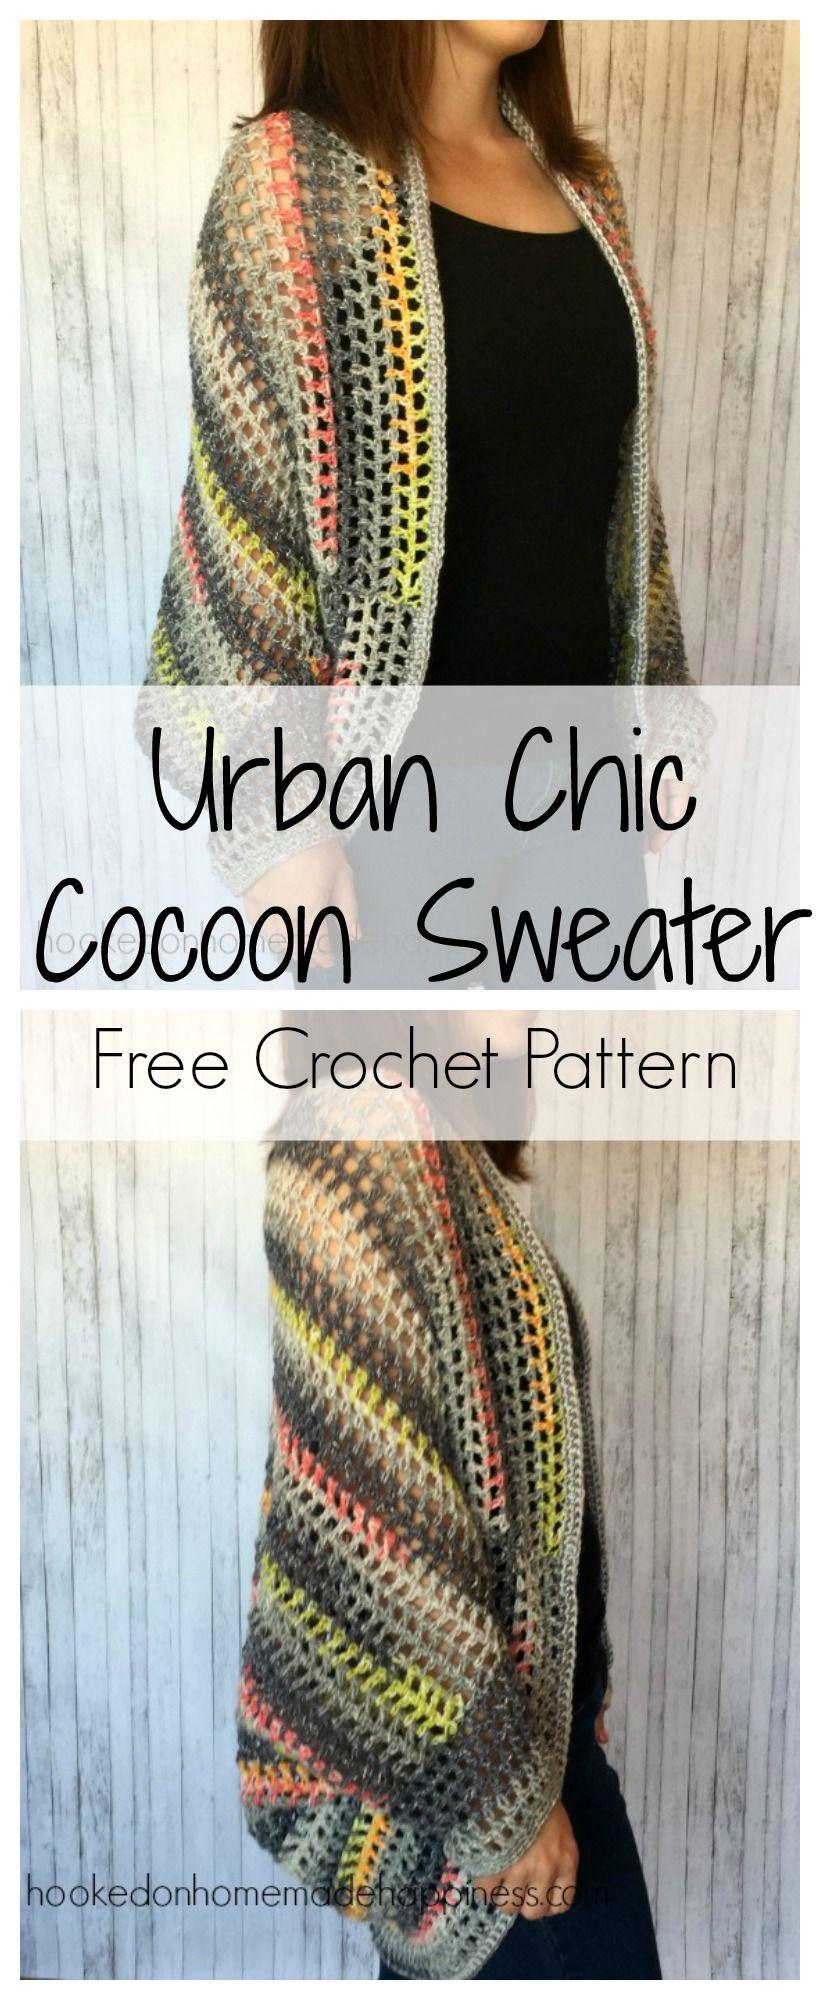 Urban Chic Cocoon Sweater Crochet Pattern | Ponchos, Tejido y Ganchillo